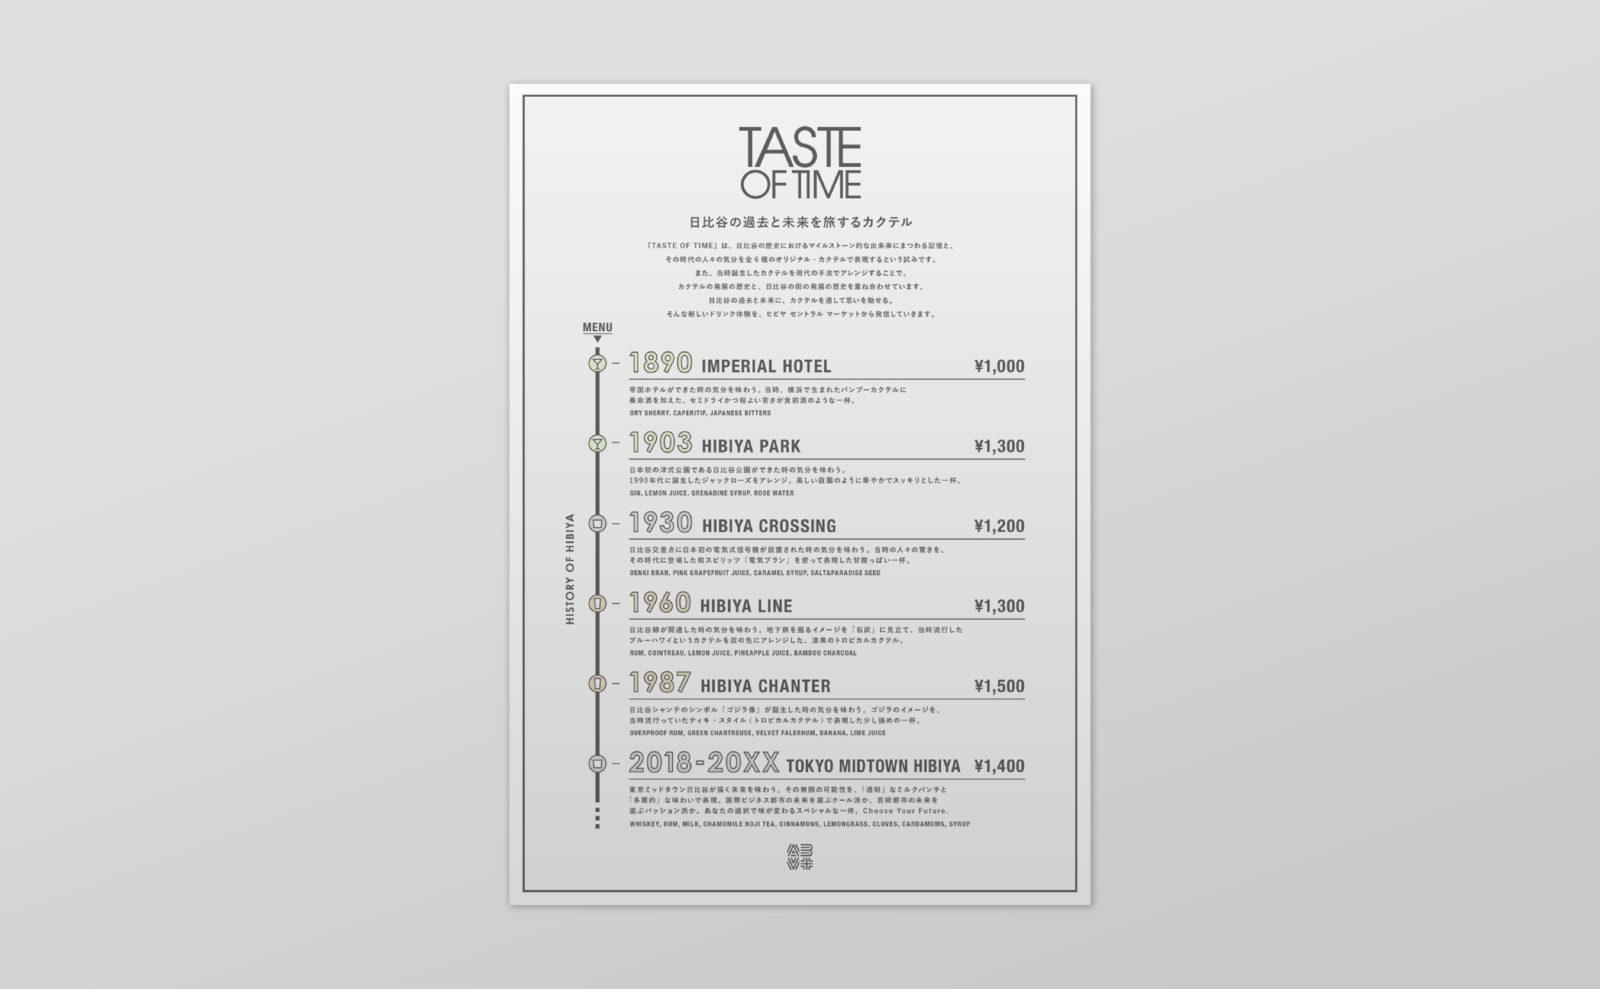 TASTE OF TIME__-3